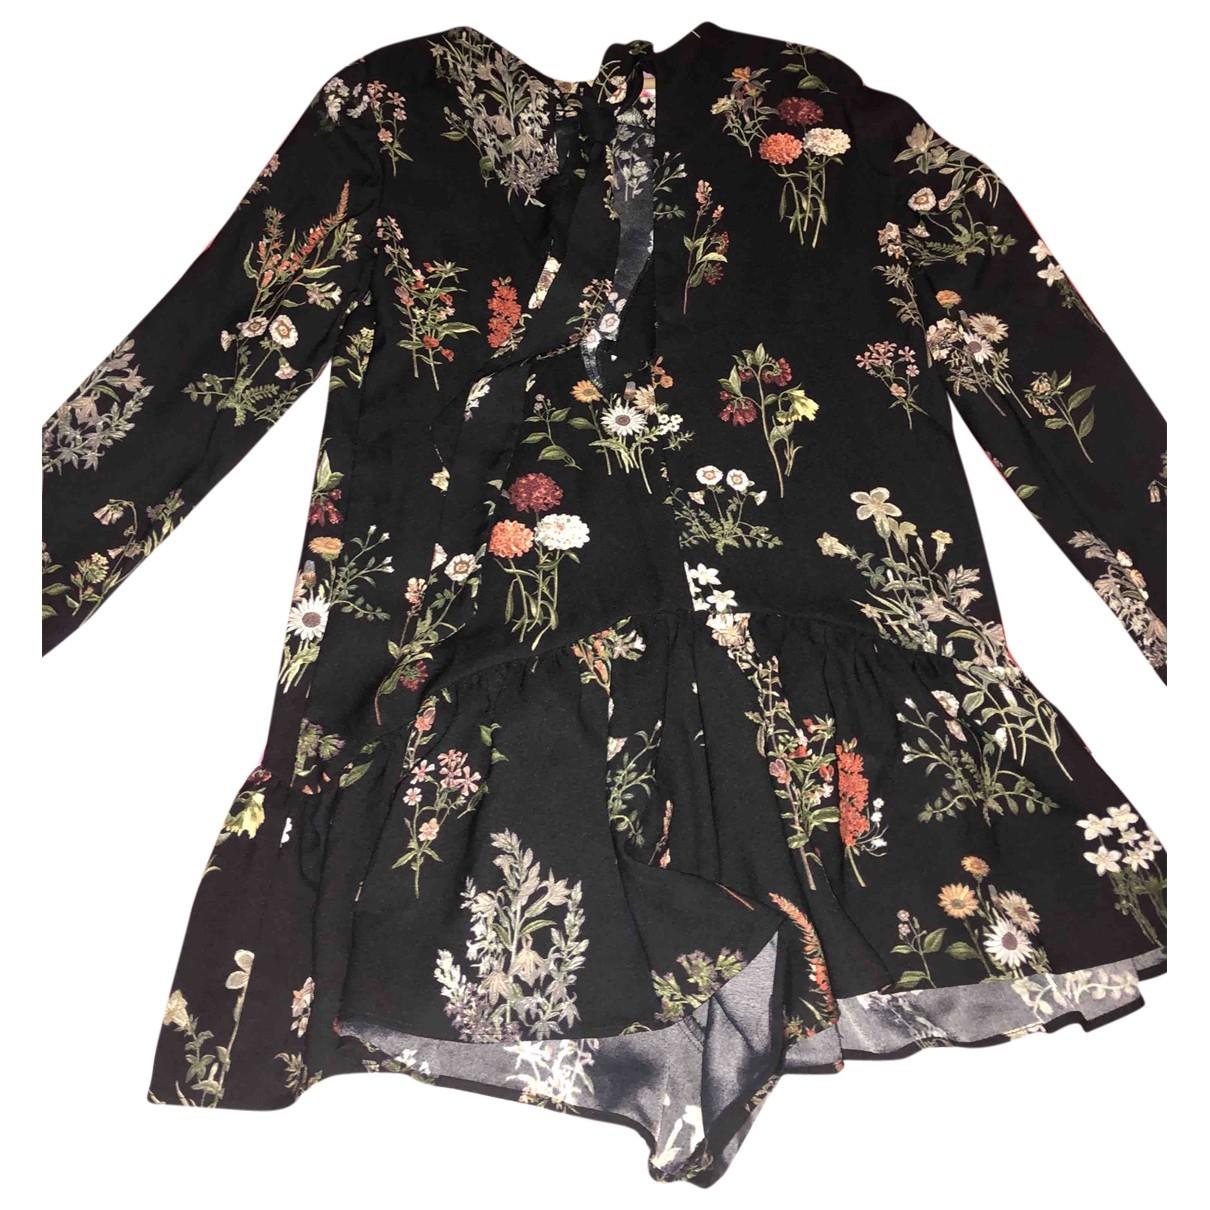 Zara \N Black Cotton jumpsuit for Women 34 FR